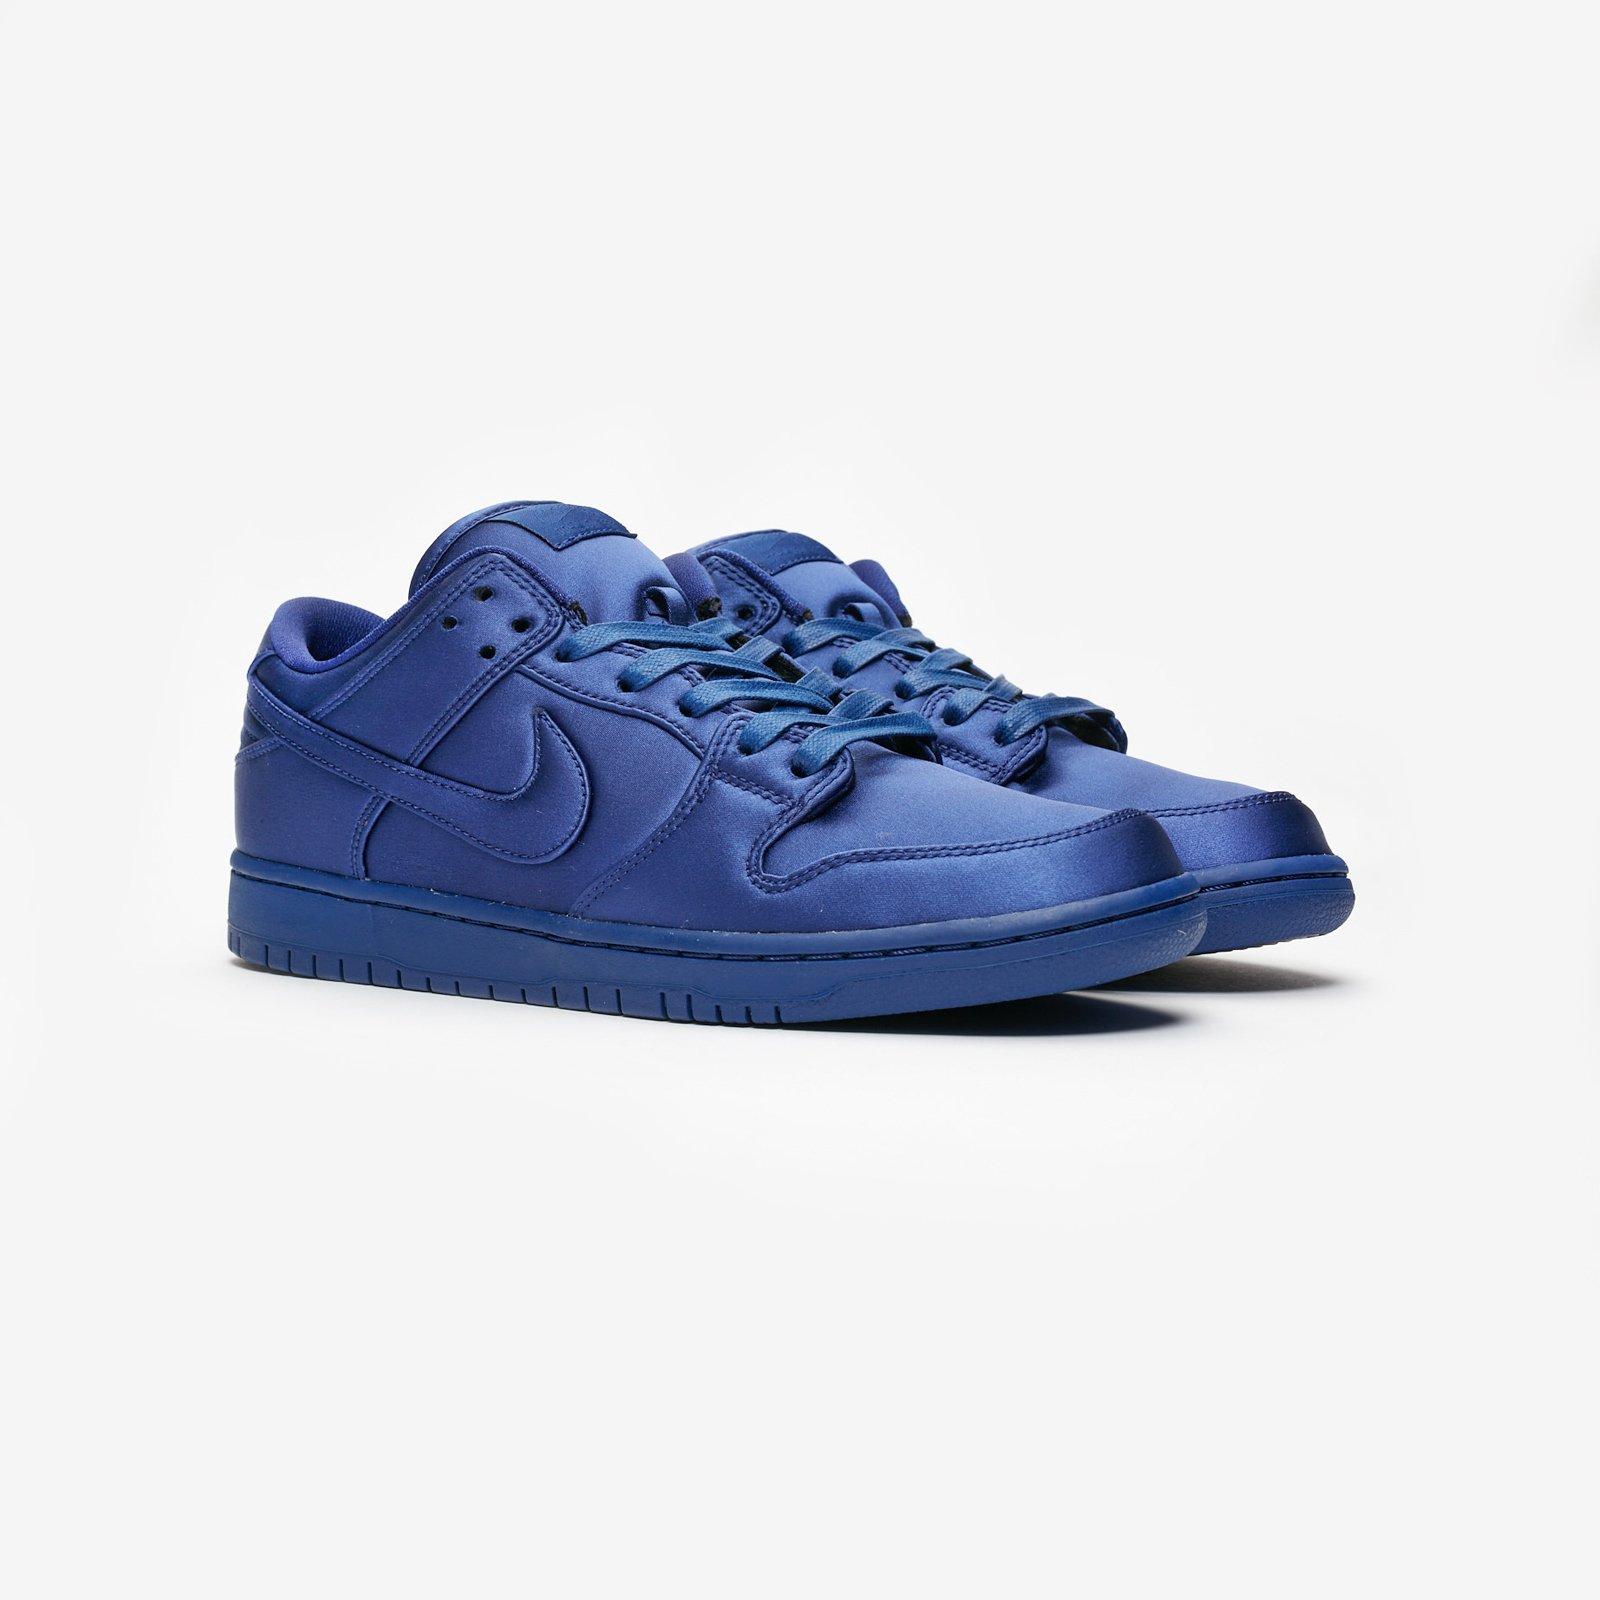 on sale c619c 431f6 Nike SB SB Dunk Low TRD NBA